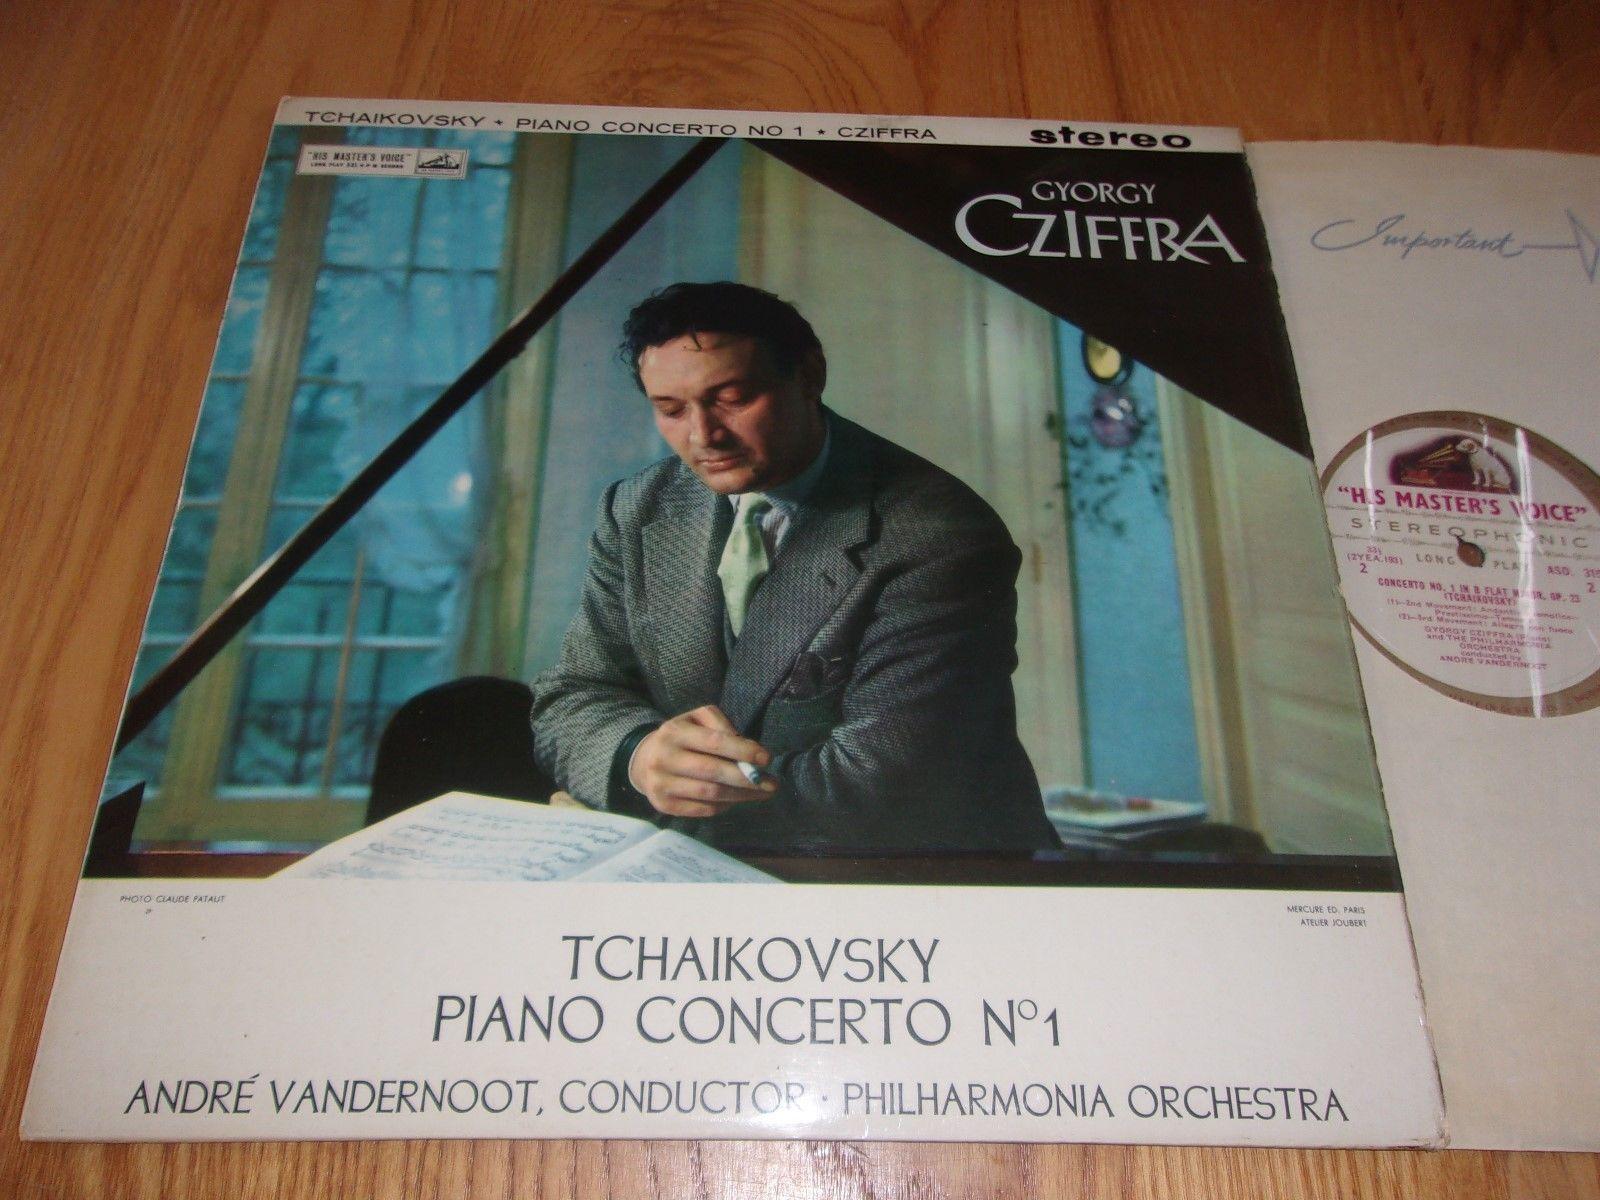 HMV ASD 315 UK 1st C/G TCHAIKOVSKY - PIANO CONCERTO NO 1 *GYORGY CZIFFRA* EX